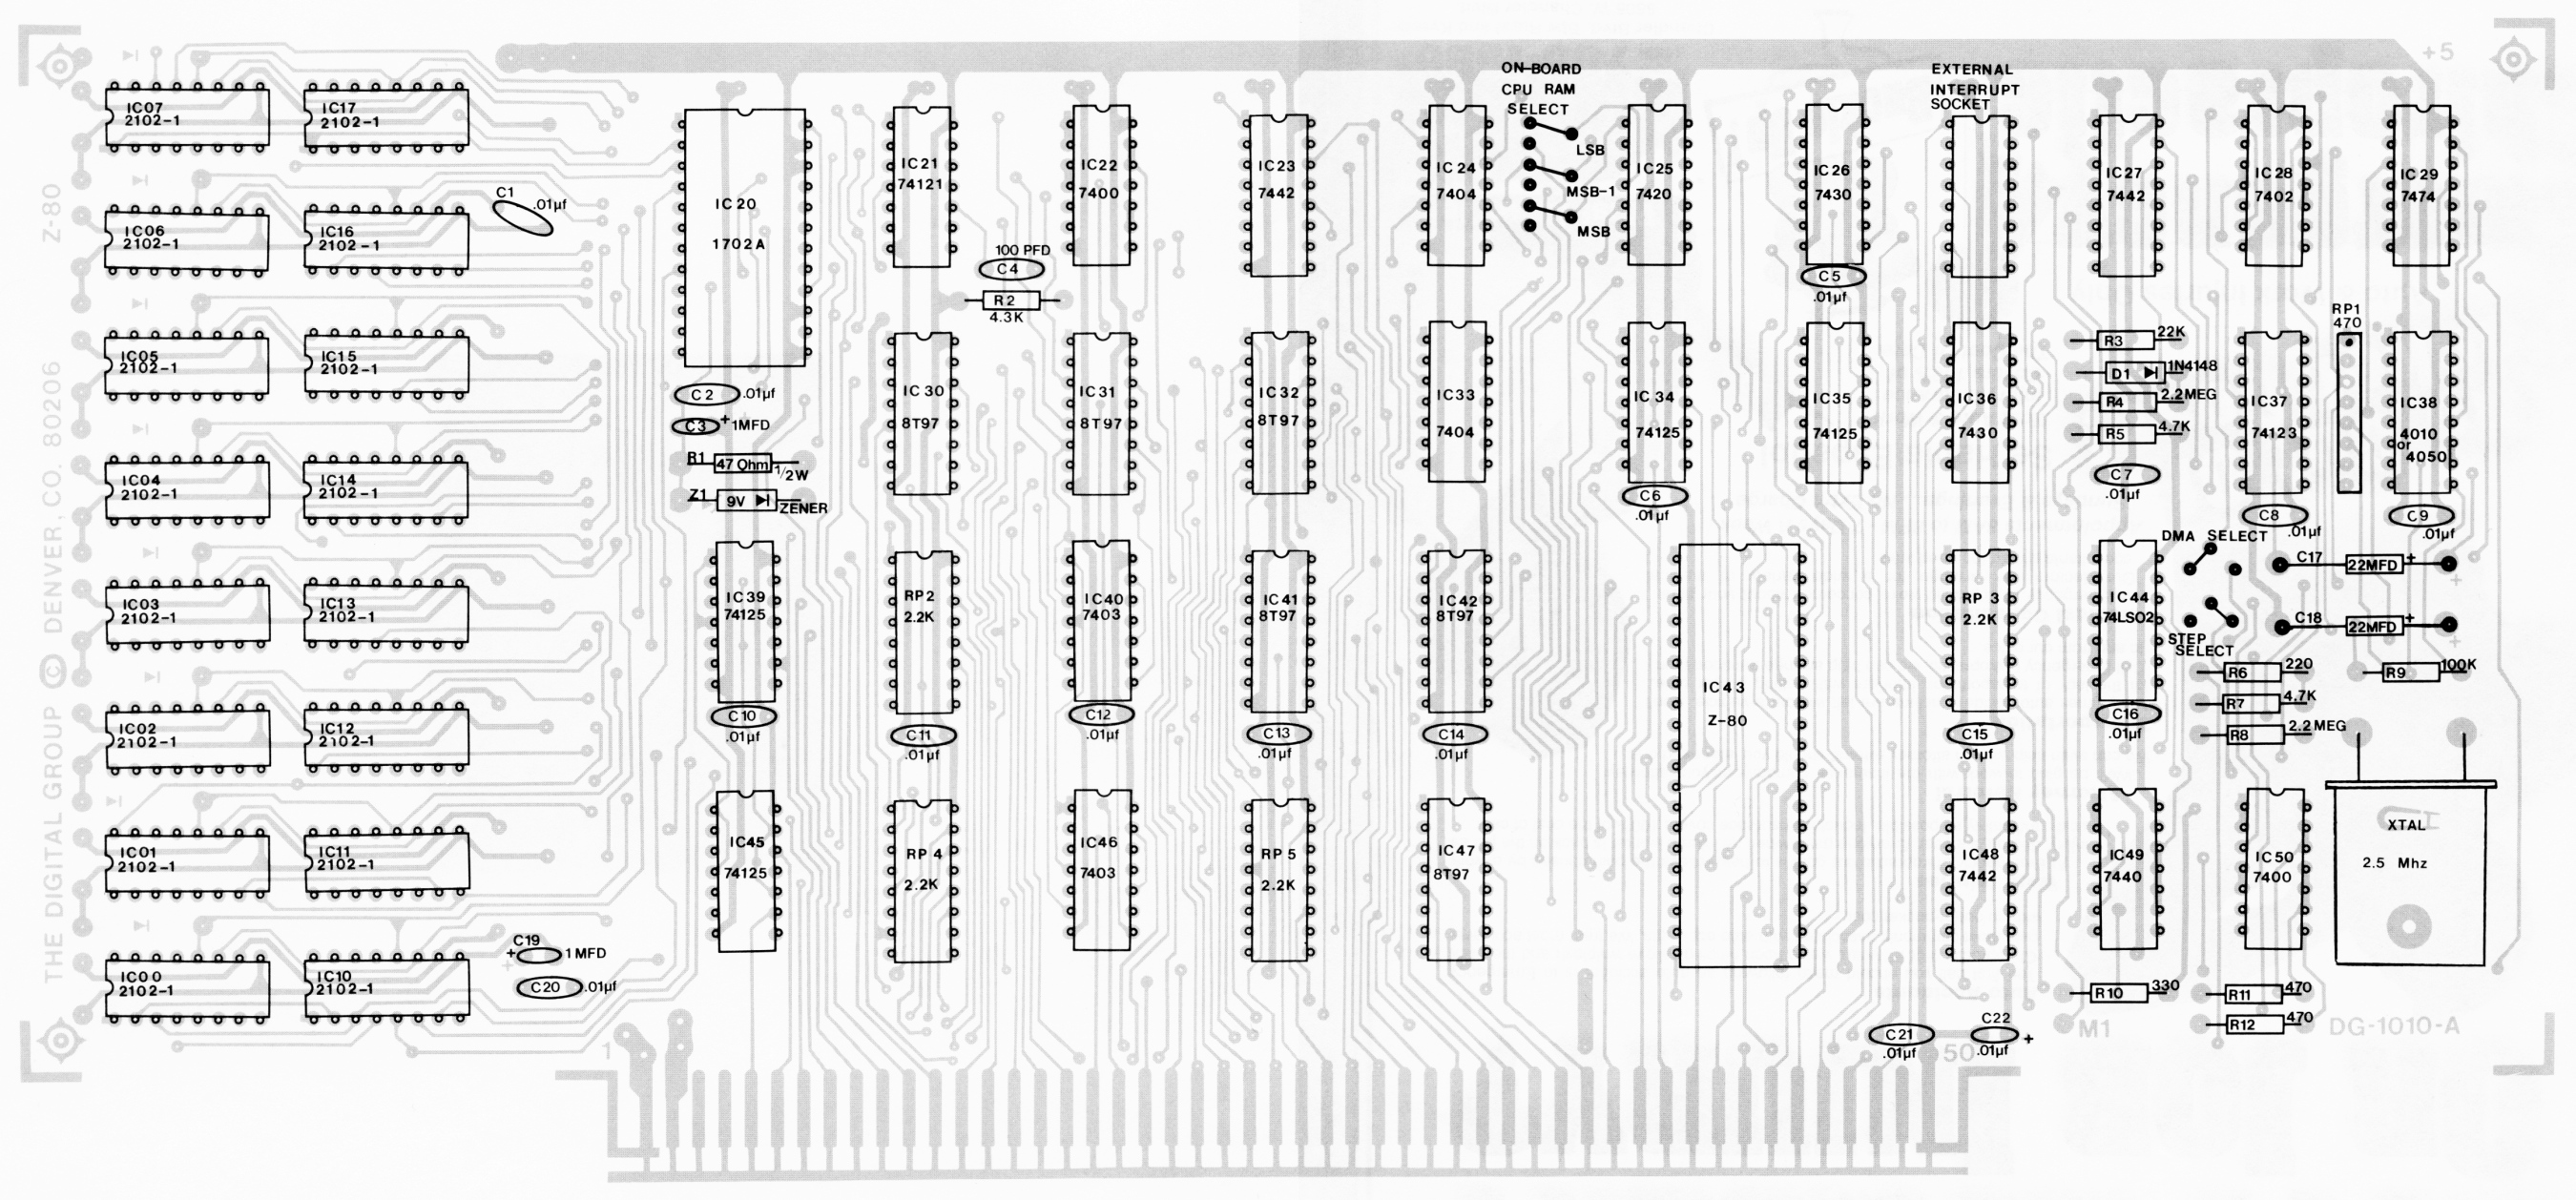 z80 processor schematic